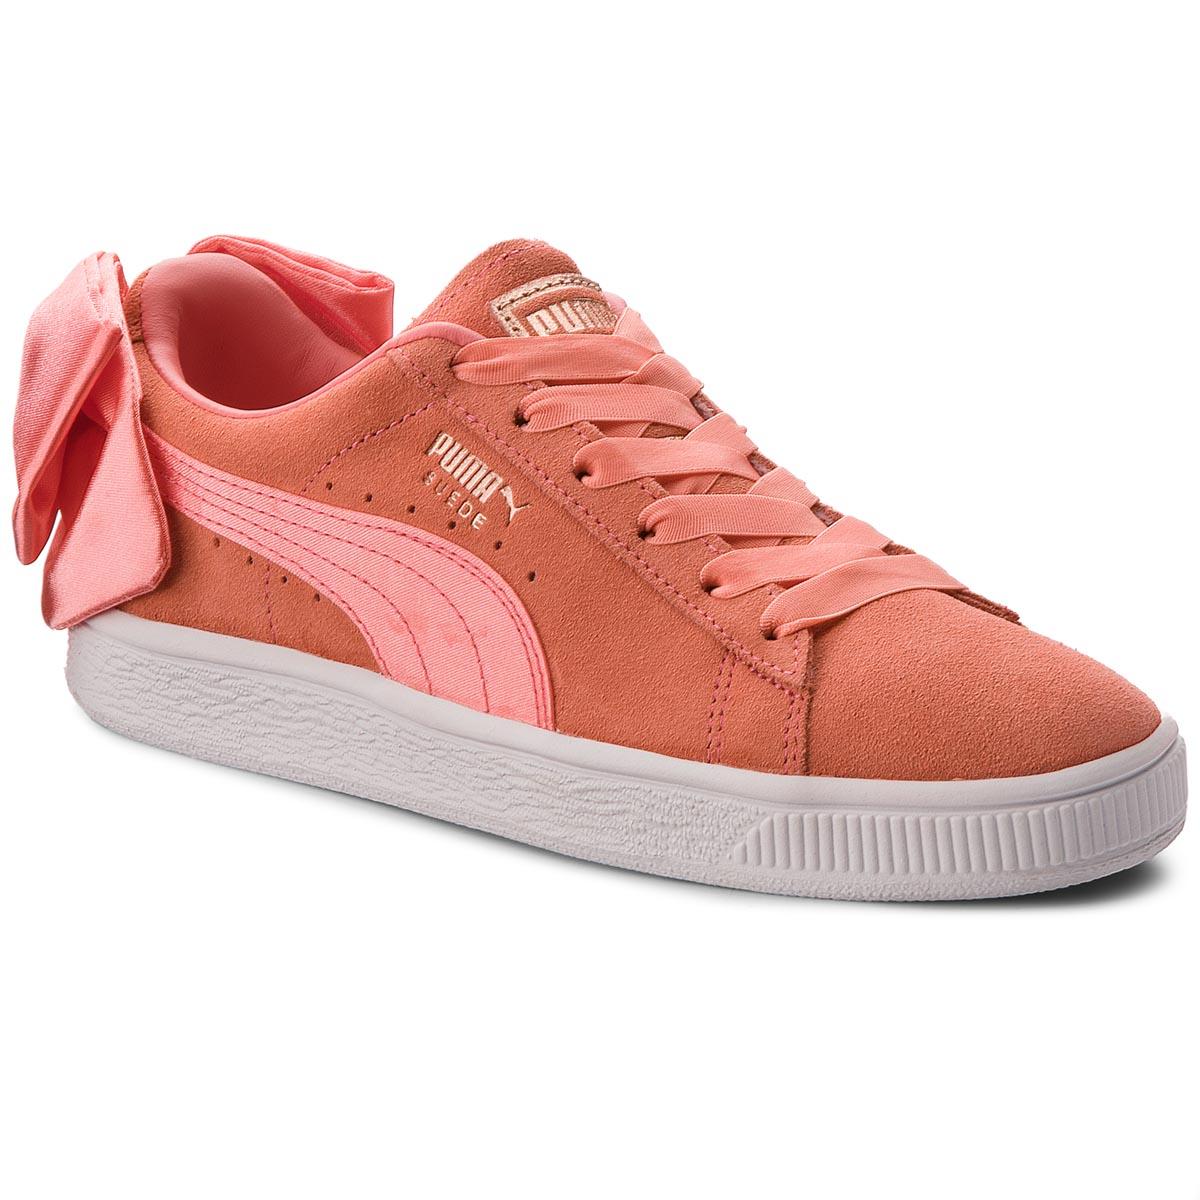 13825794db Sportcipő PUMA - Suede Bow Jr 367316 01 Shell Pink/Shell Pink - Glami.hu